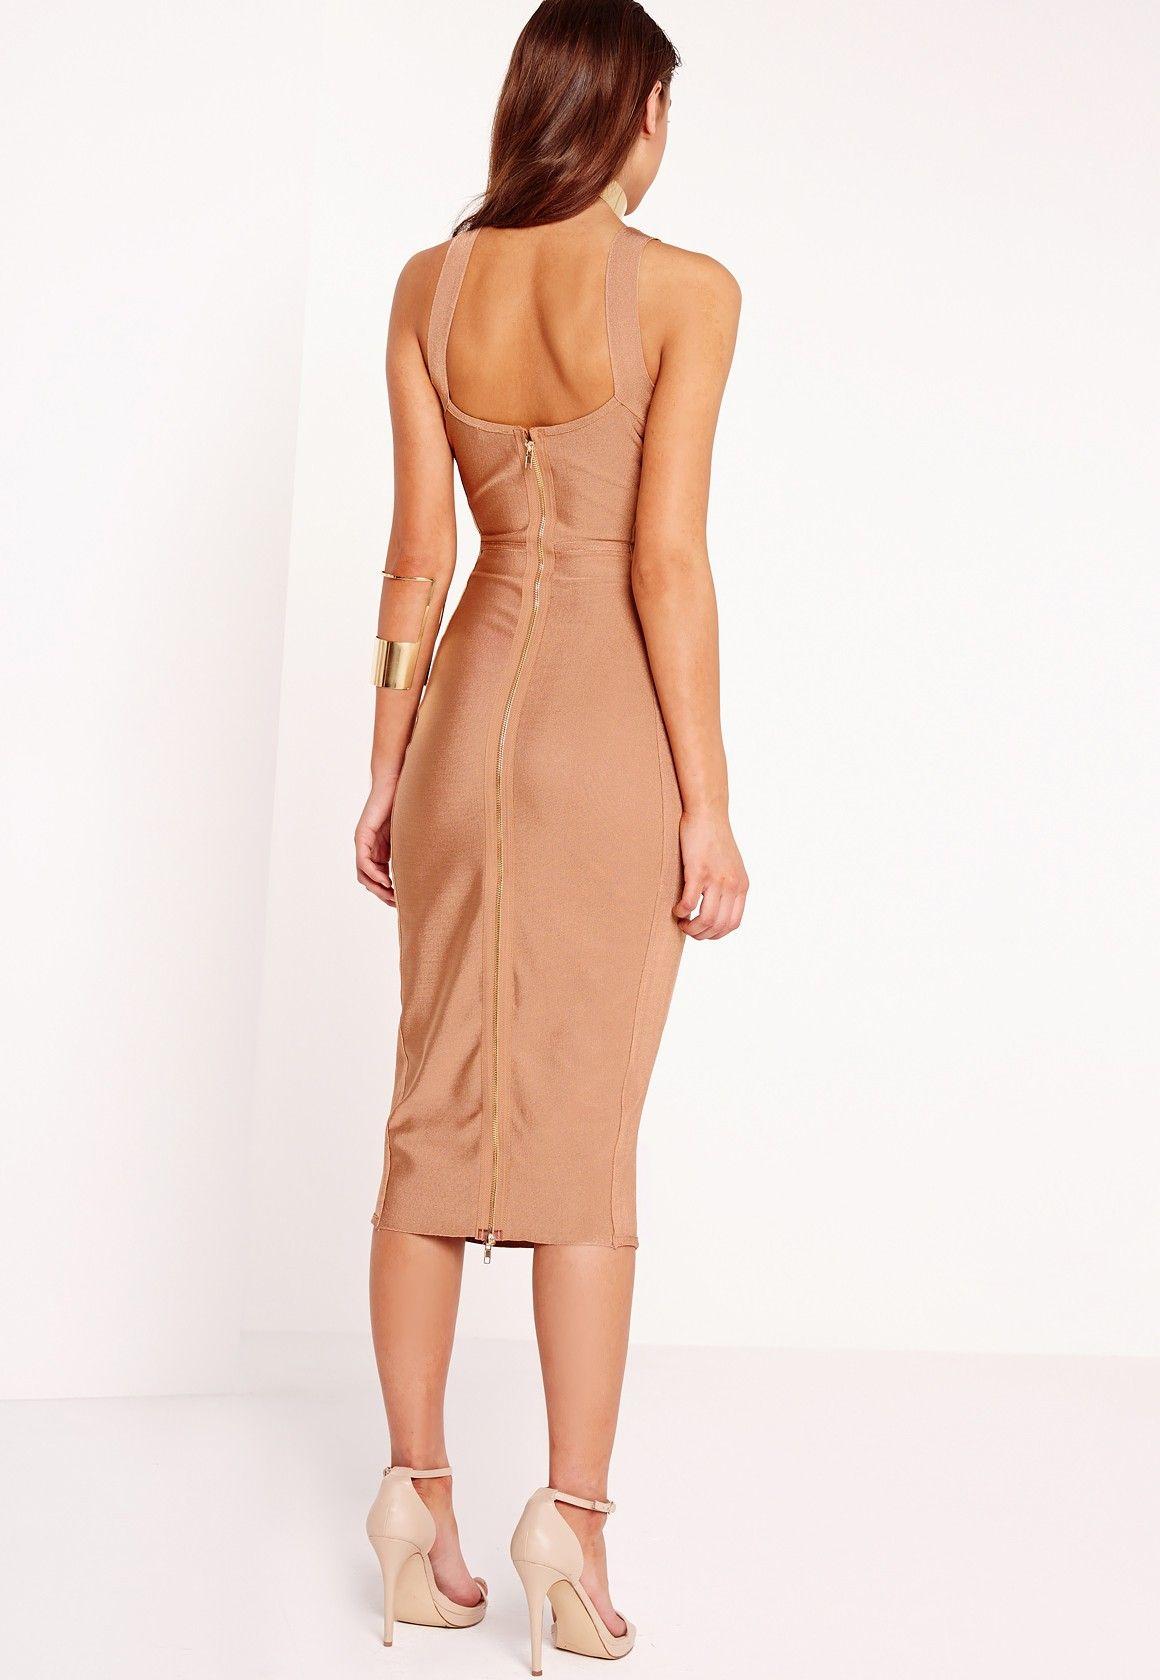 Missguided Peace Love Zip Back Bandage Midi Dress Tan Women Dress Online Bandage Midi Dress Womens Dresses [ 1680 x 1160 Pixel ]